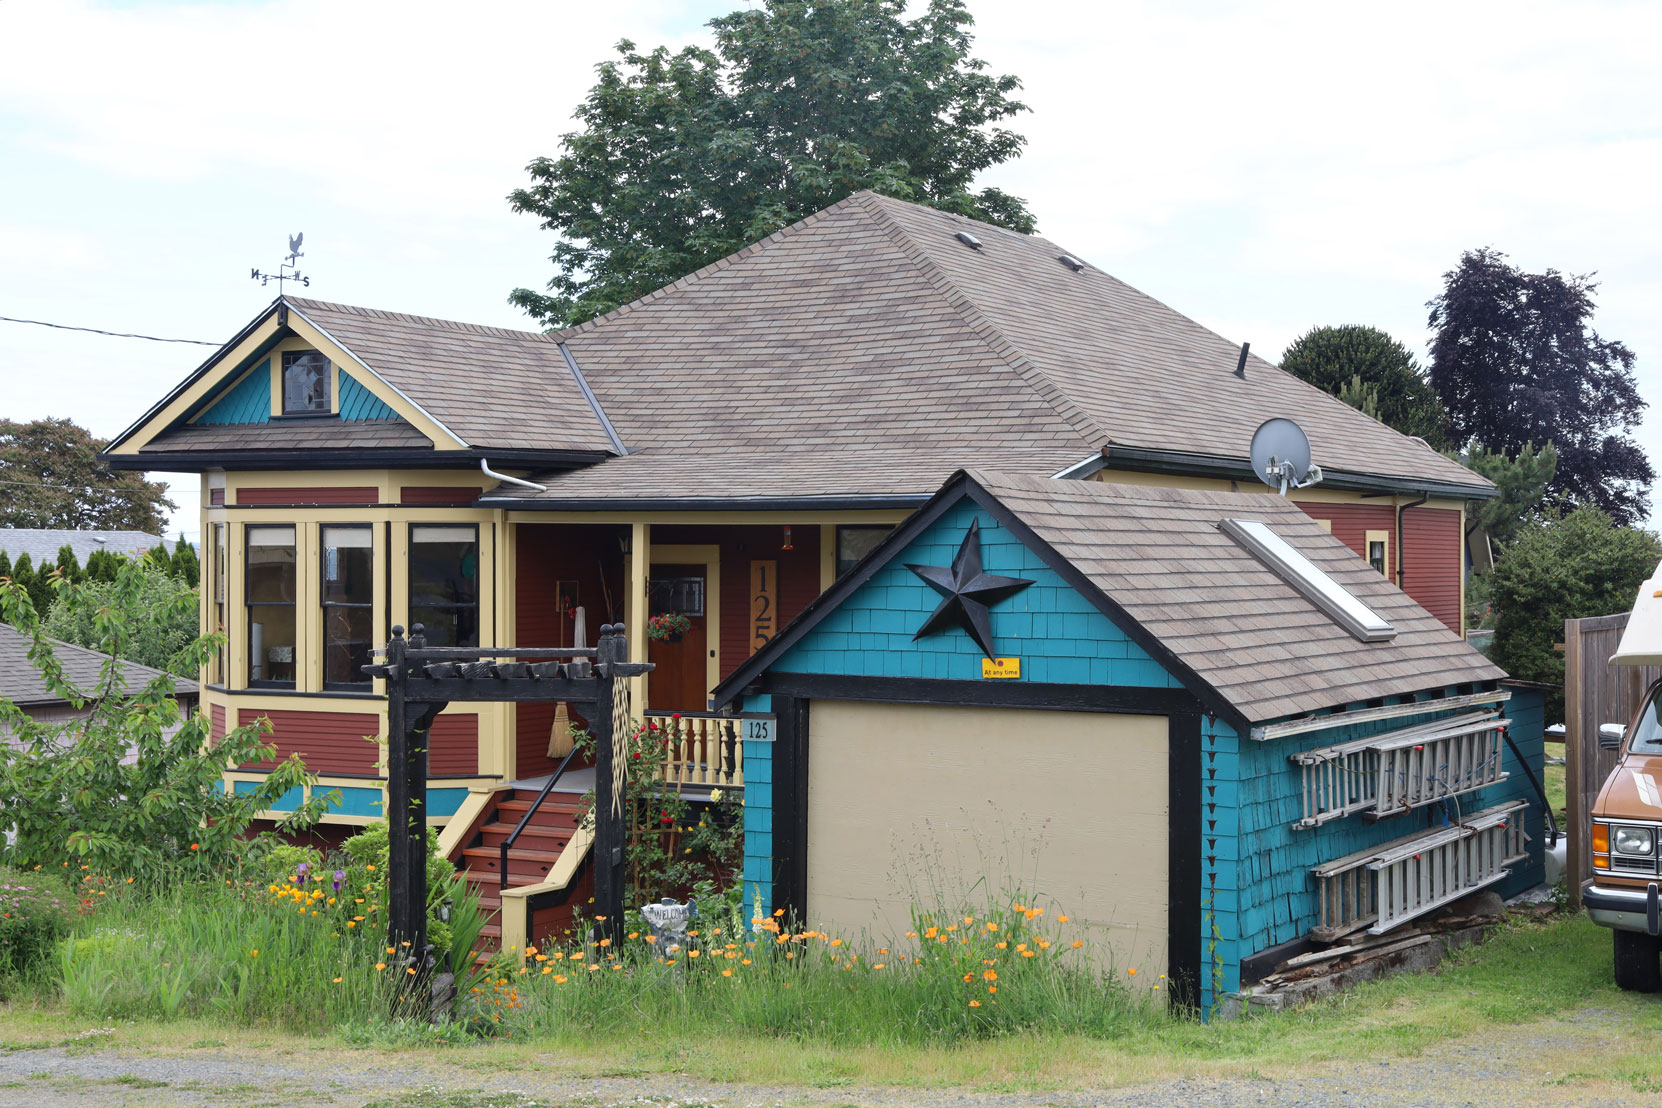 125 Methuen Street, Ladysmith, BC, built in 1901.